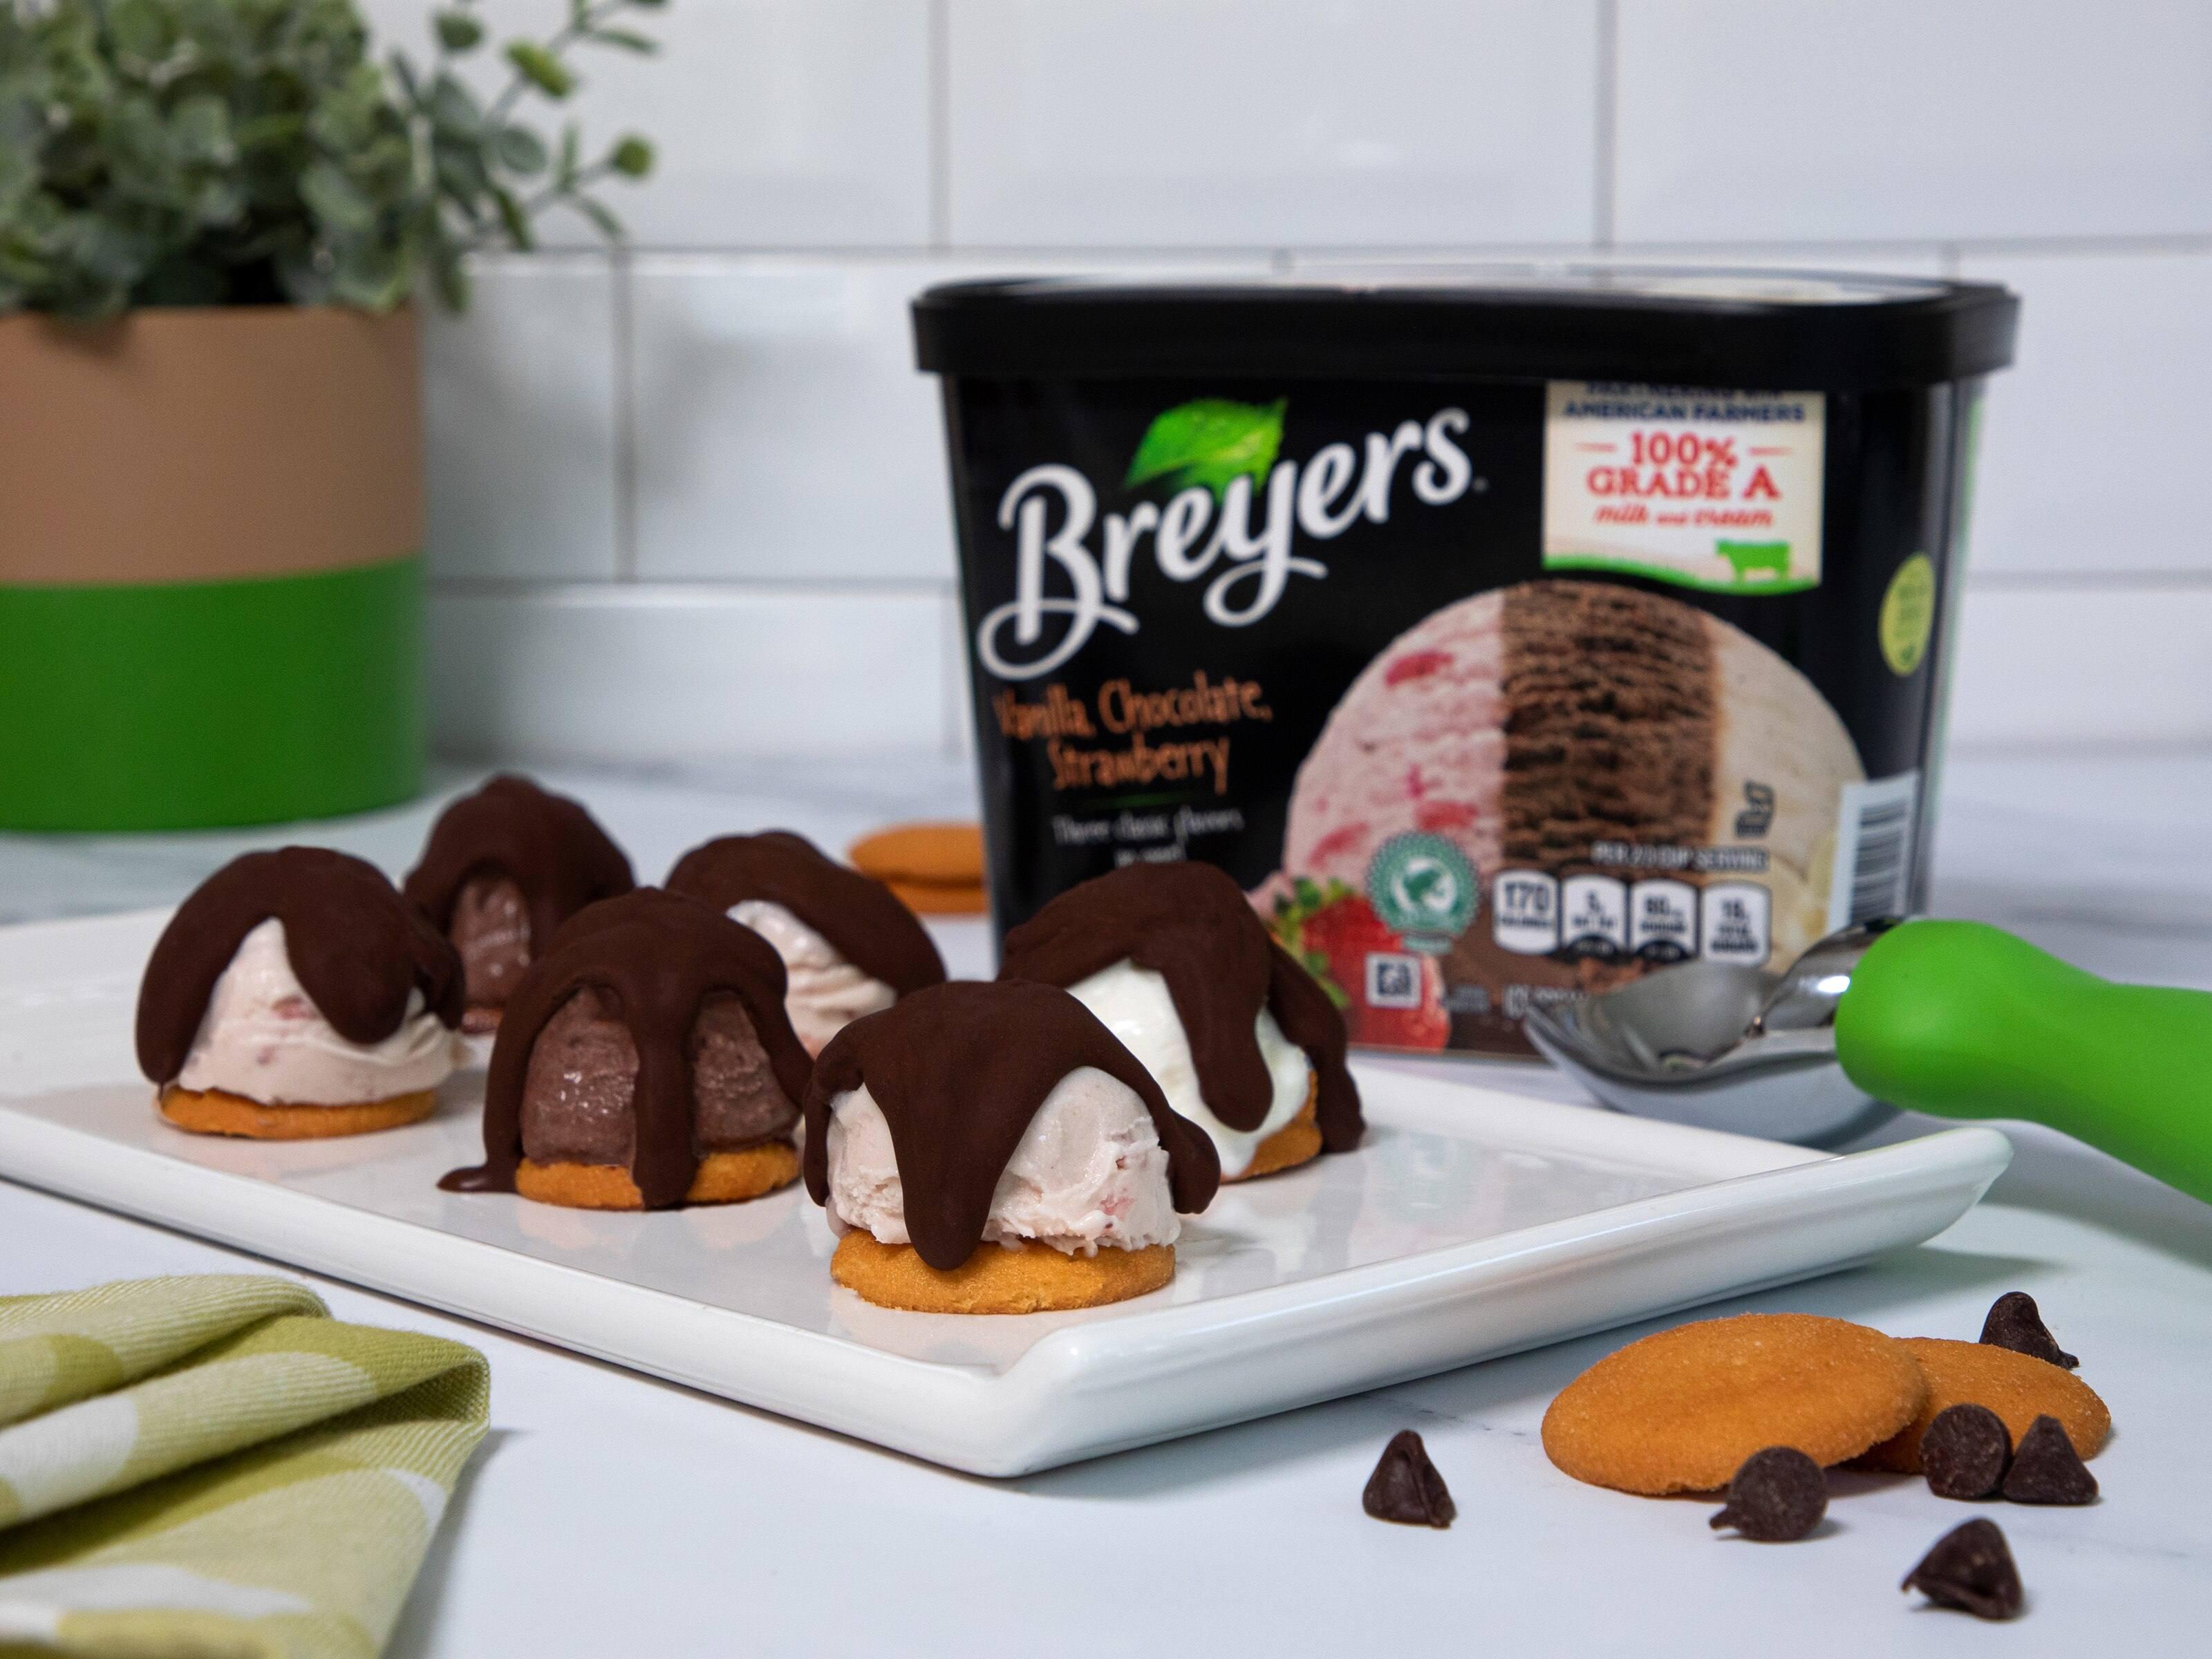 Homemade Ice Cream Bonbons